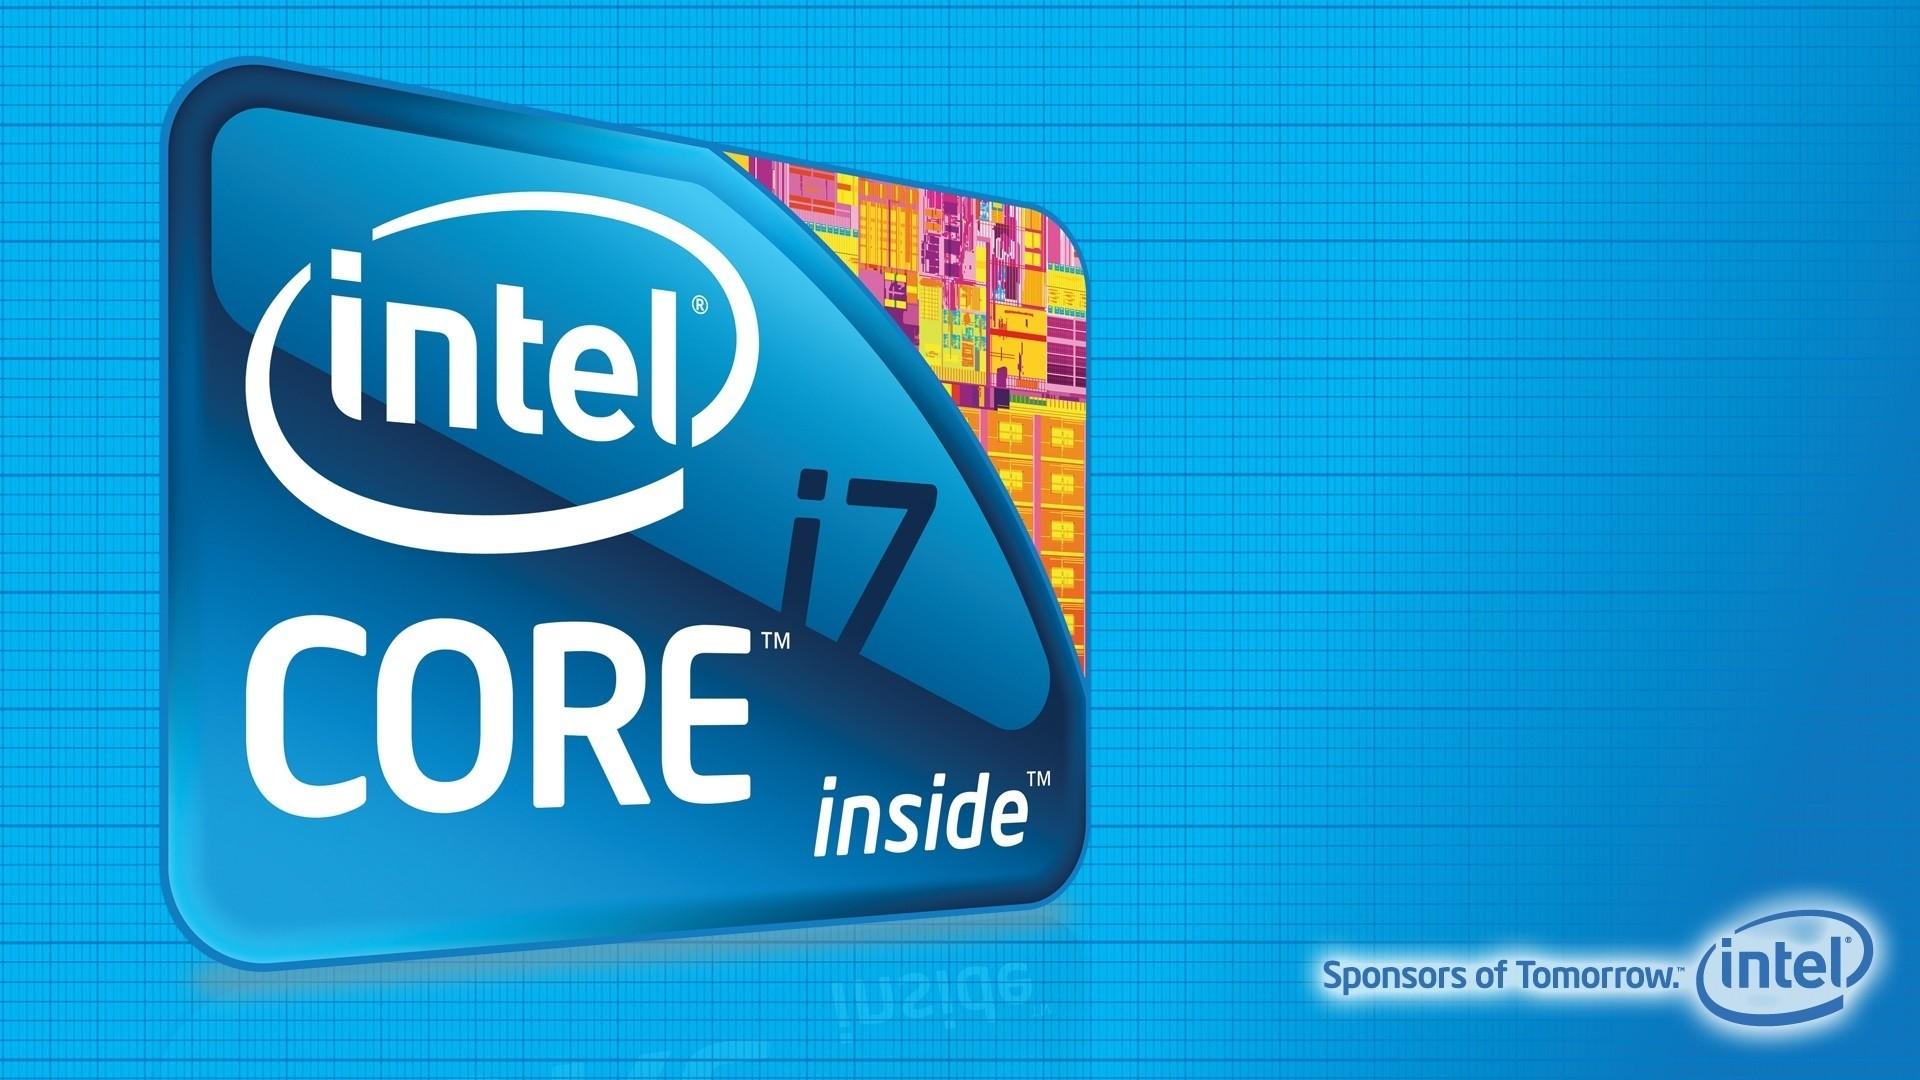 Intel Wallpaper Image